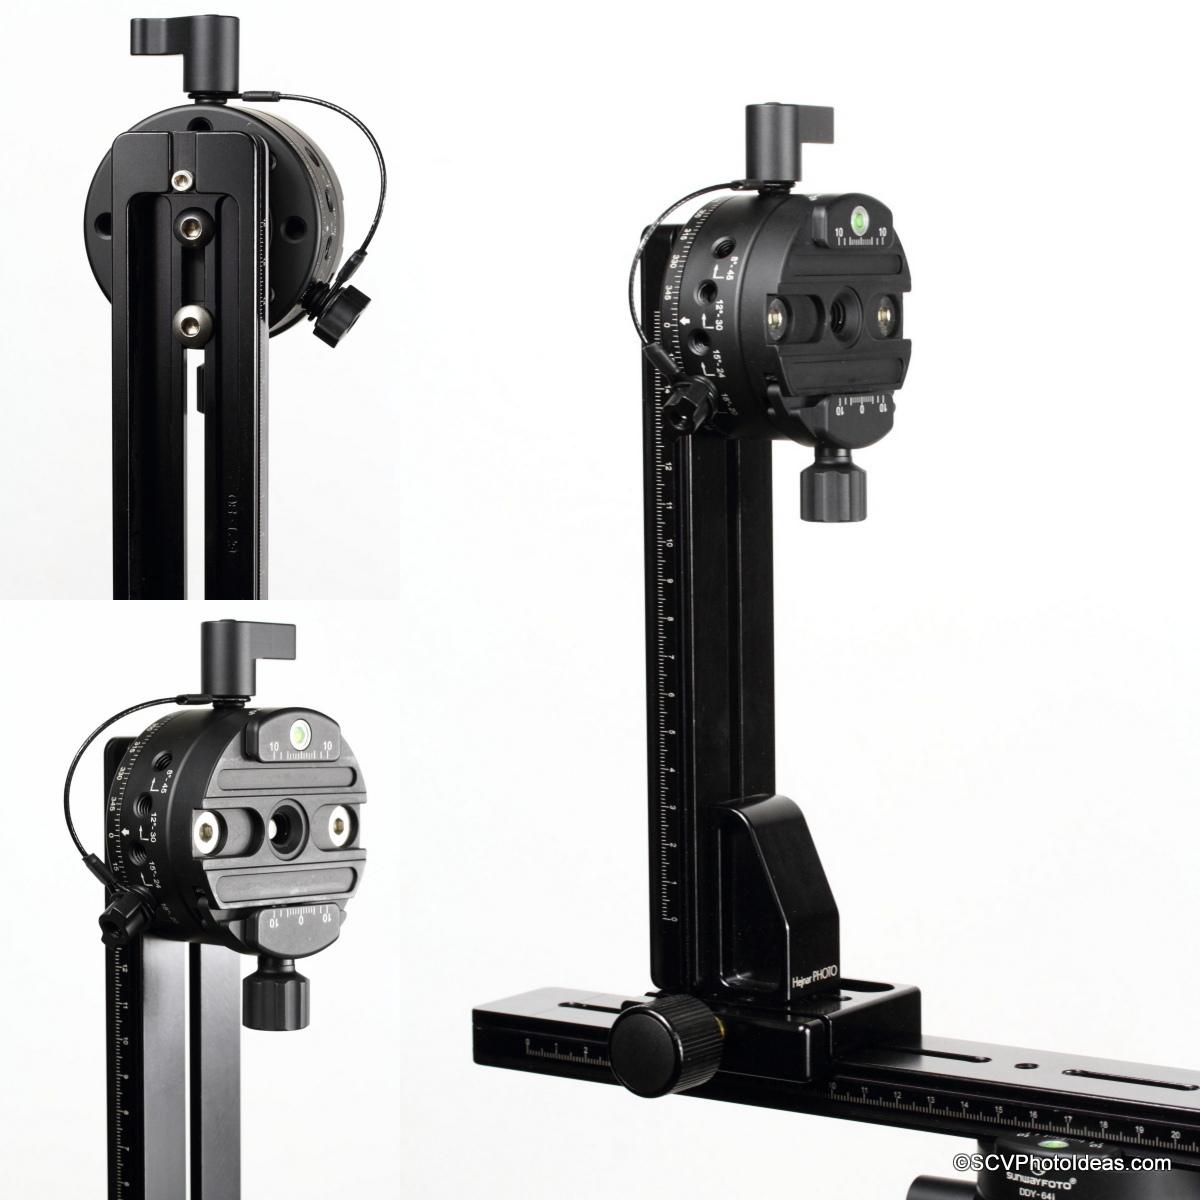 HDR Panorama rail Assembly w/ Sunwayfoto DDP-64SI & Hejnar rails